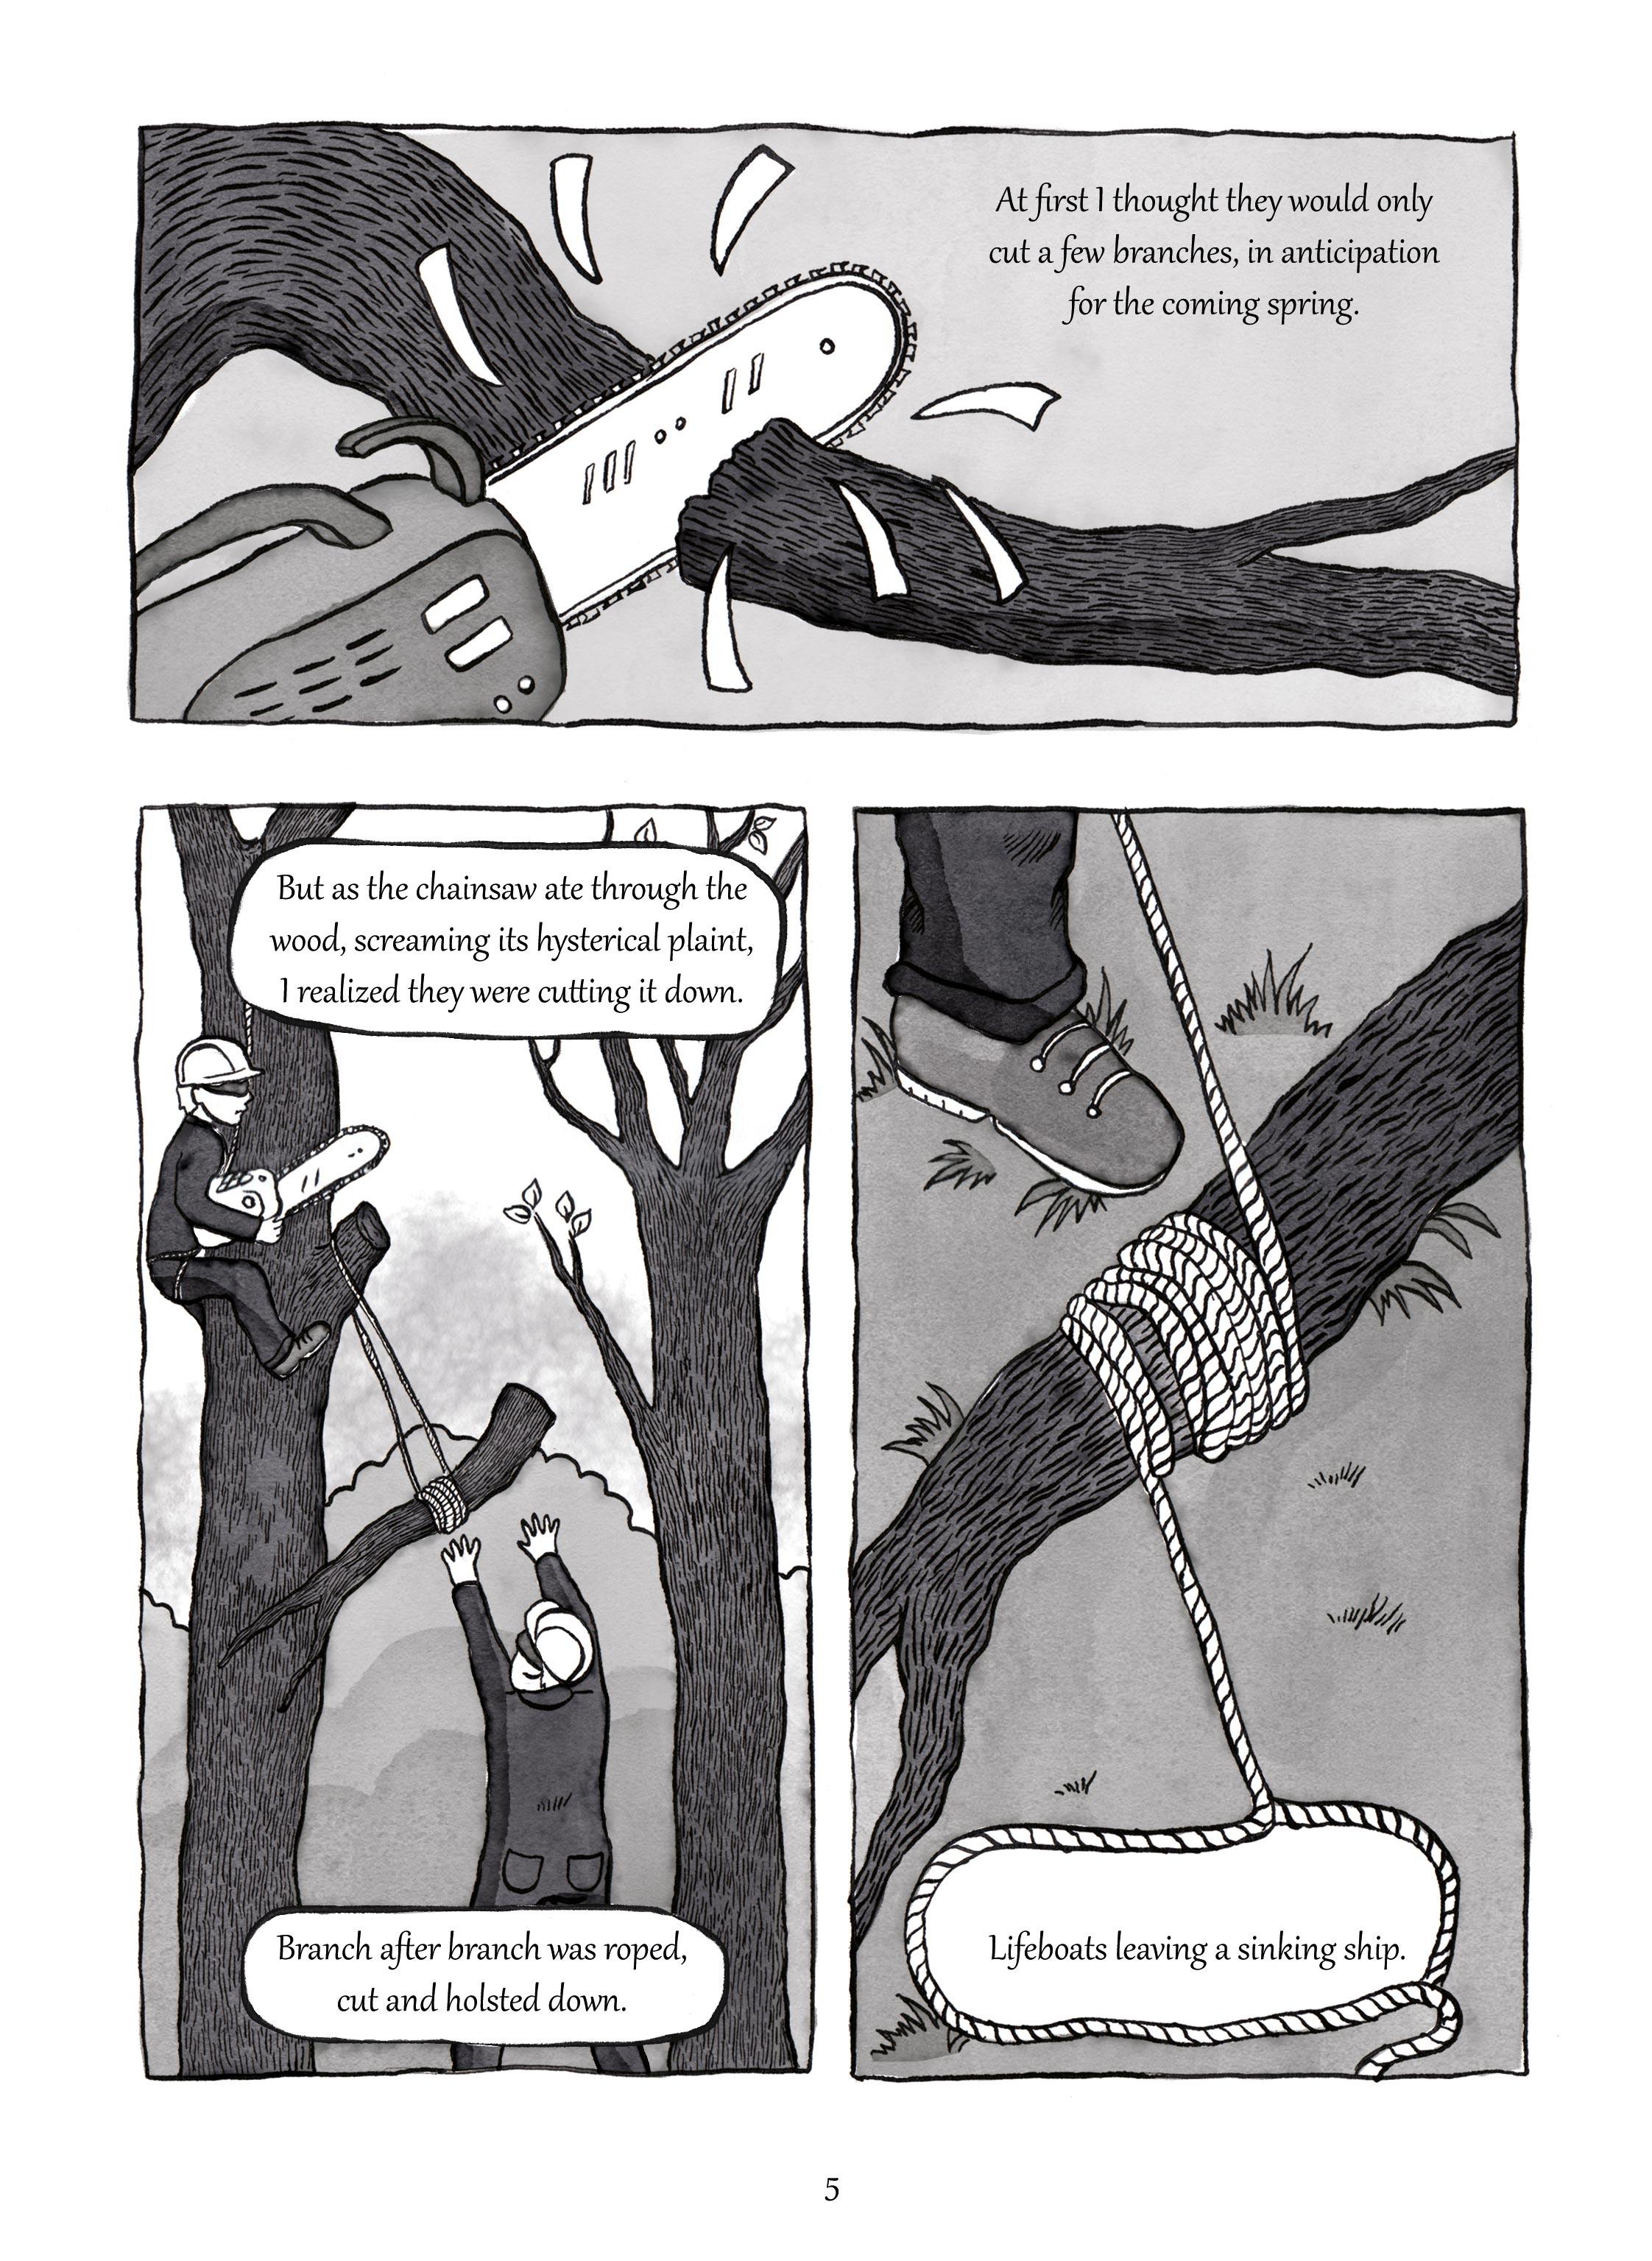 Marie-de-Beaucourt-Illustration-Two-Trees-Graphic-Novel-page5.jpg